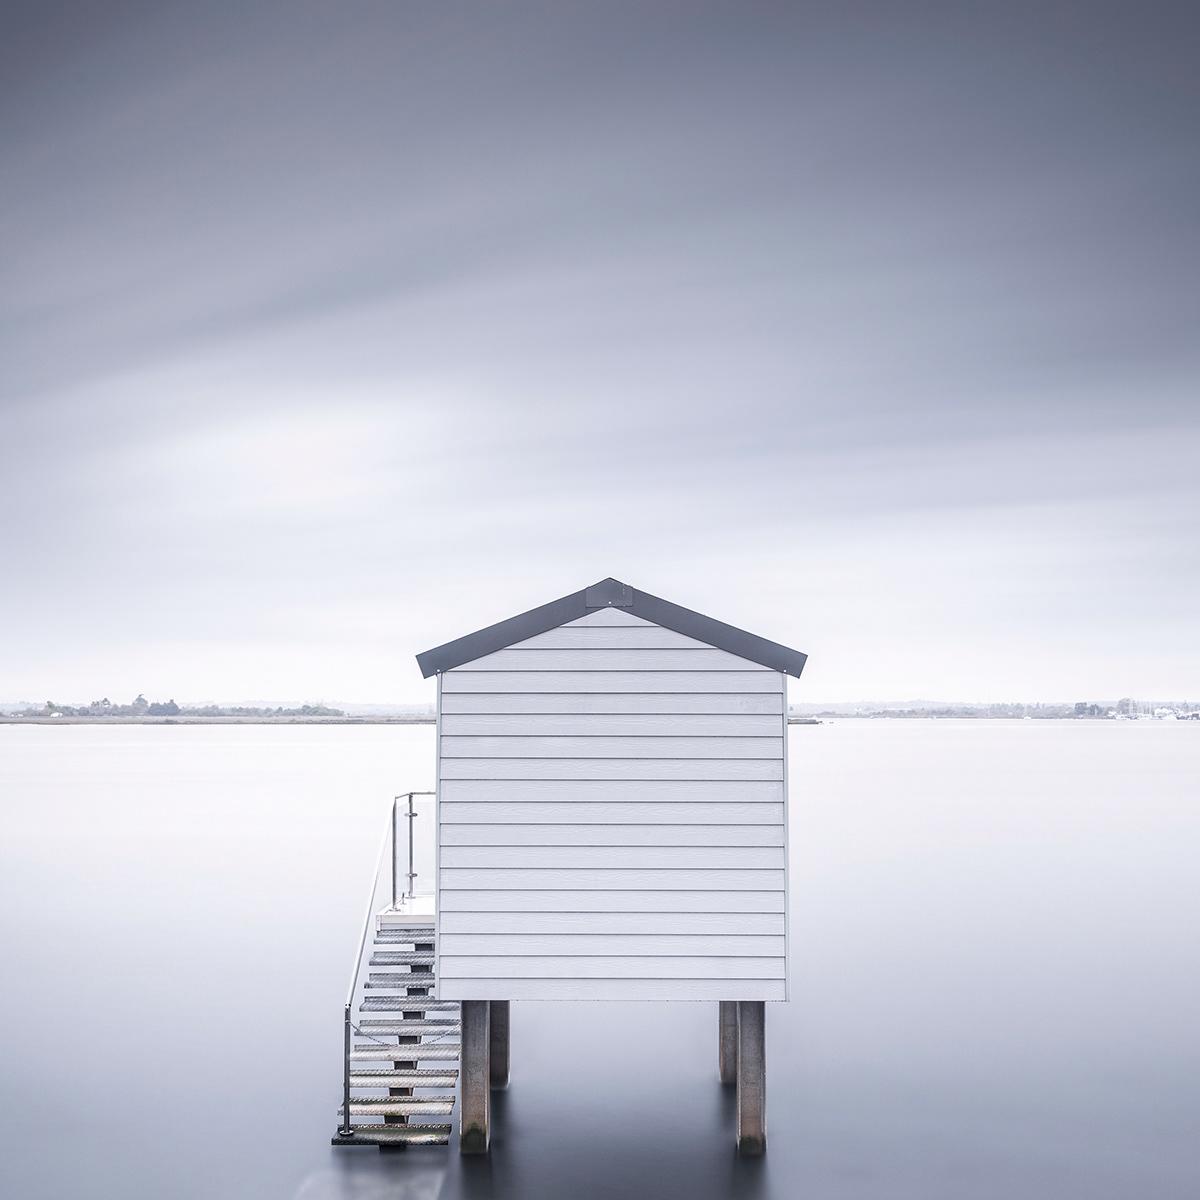 FINEART wallart longexposure water calm minimalist minimal anthonylamb